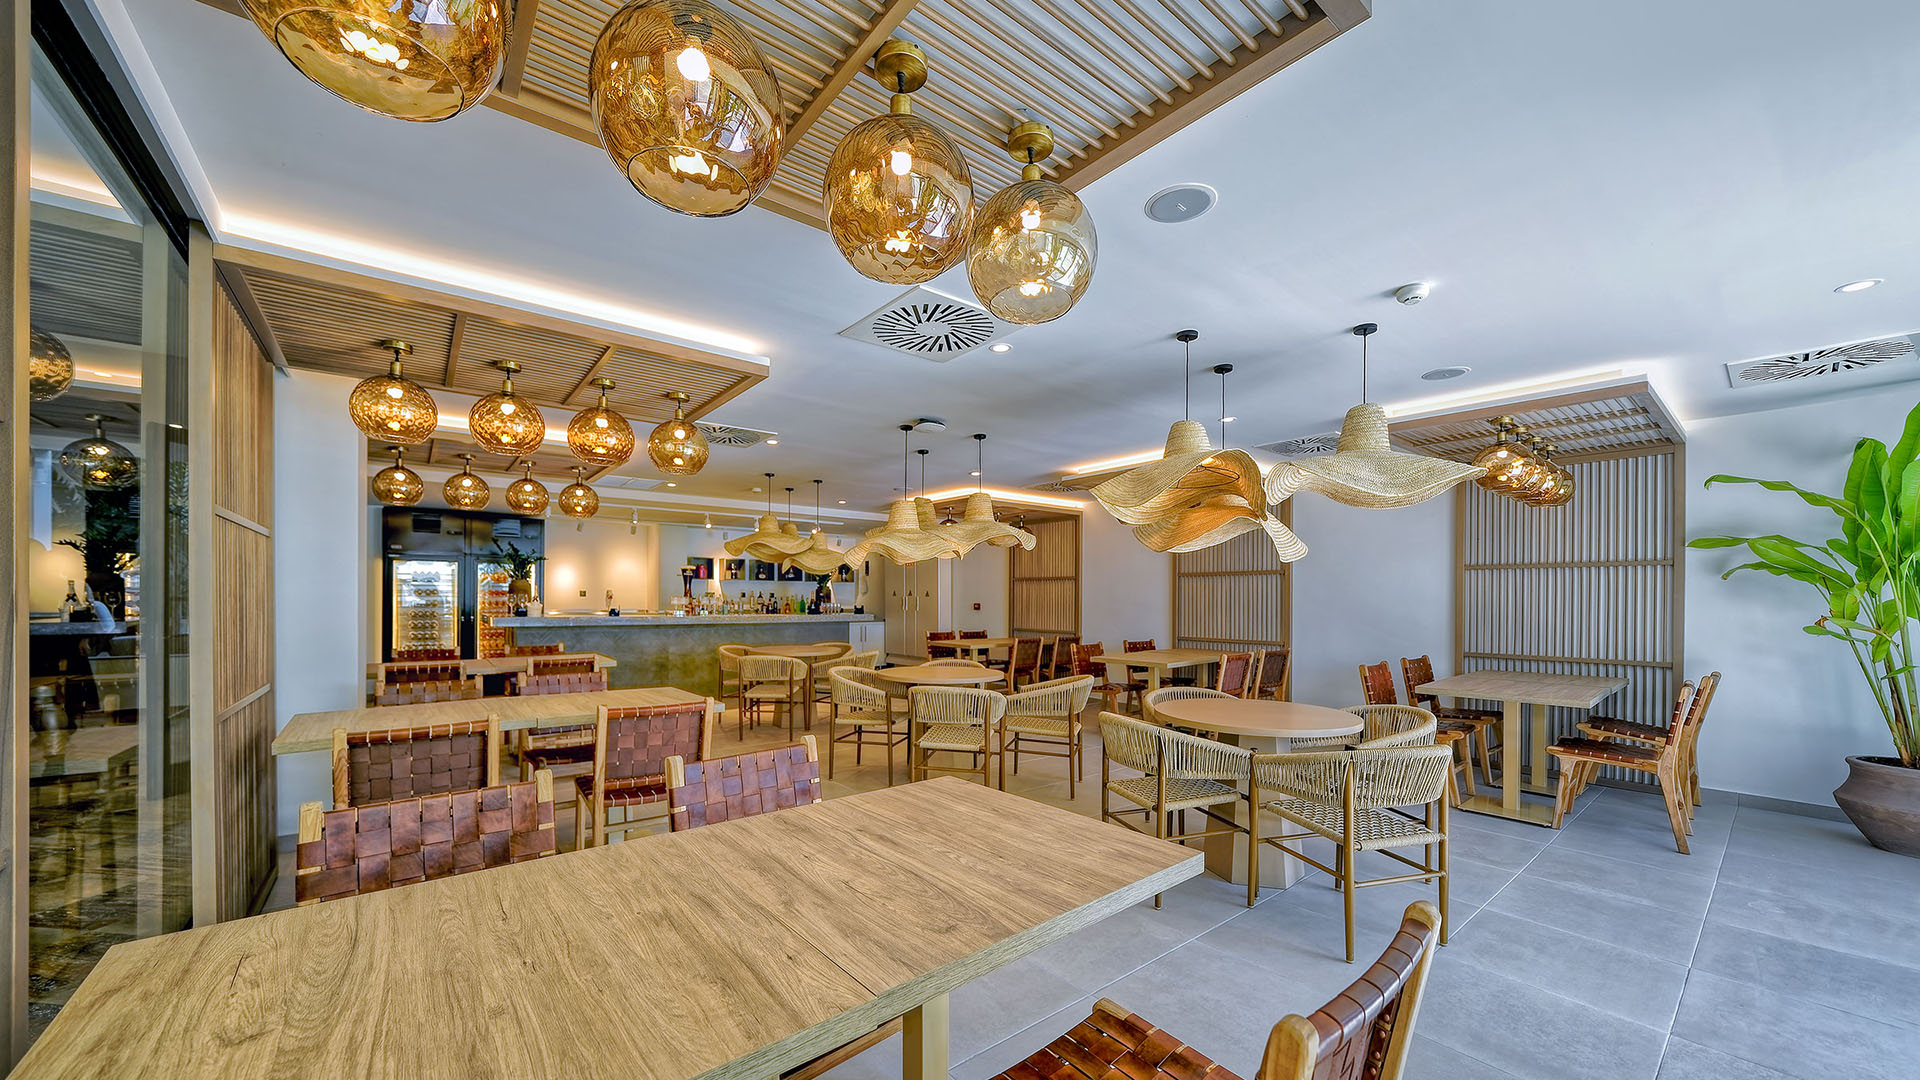 labranda-costa-mogan-hotel-gran-canaria 3630